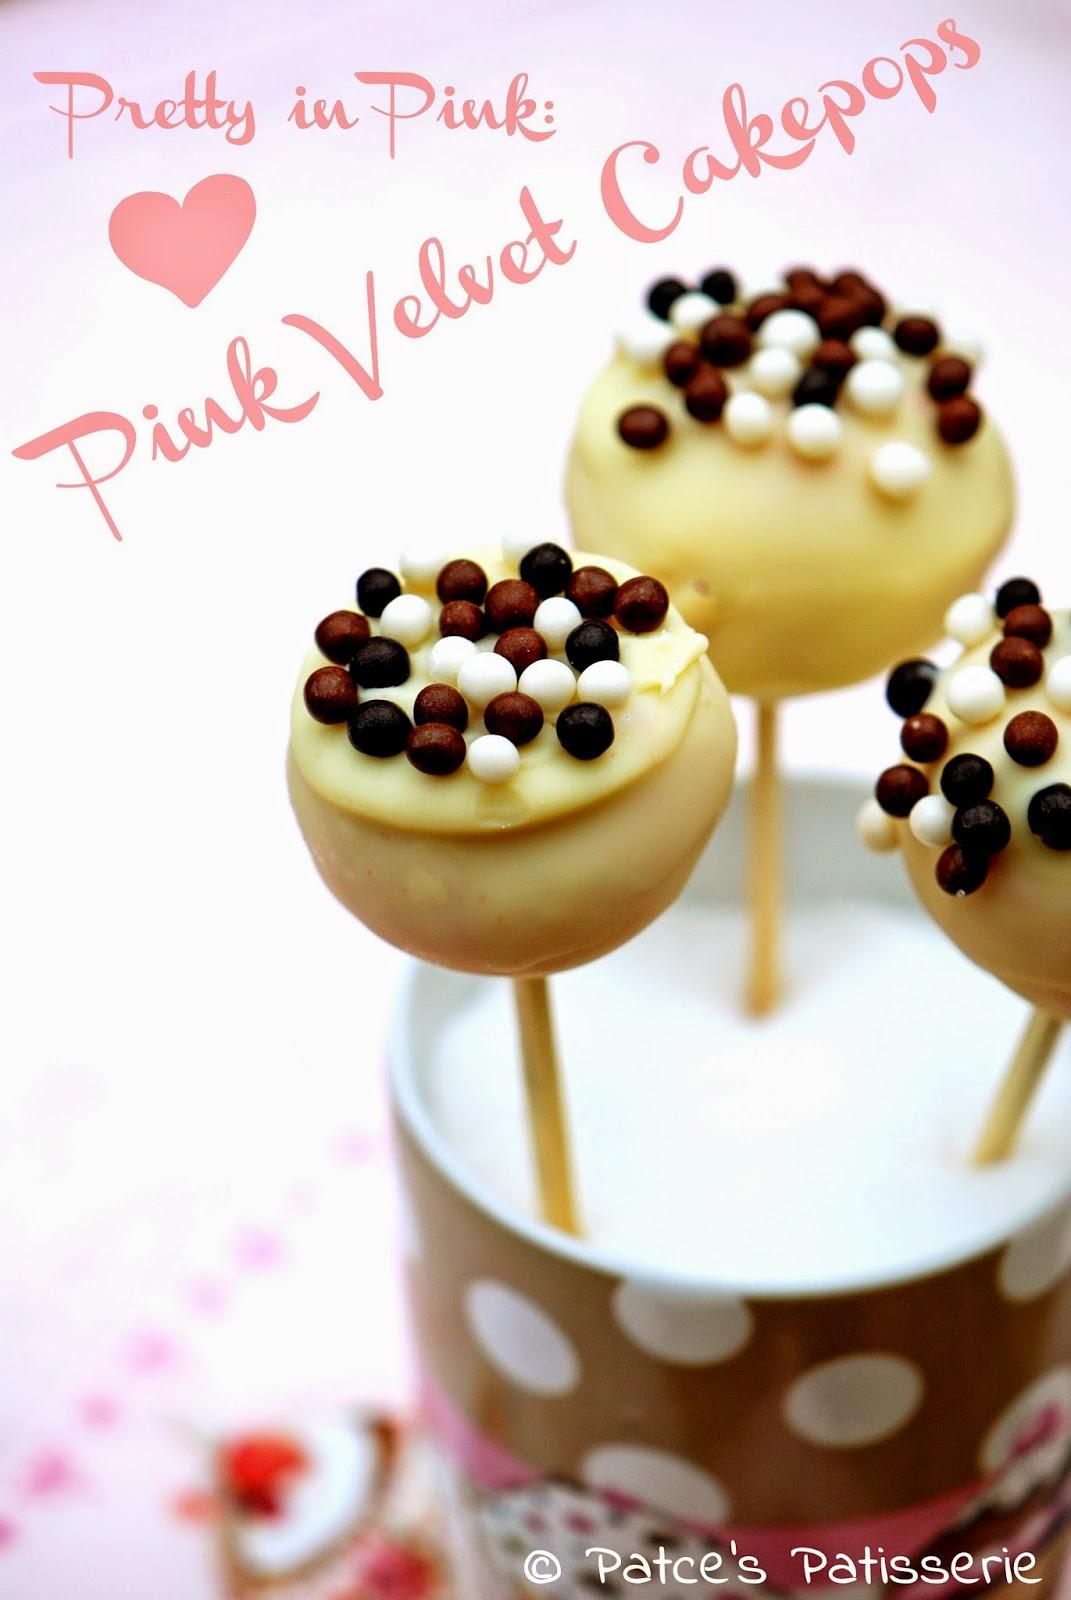 Patces Patisserie Juni 2014 Red Velvet Nougat Cake 30x30cm Pretty In Pink Cakepops Think